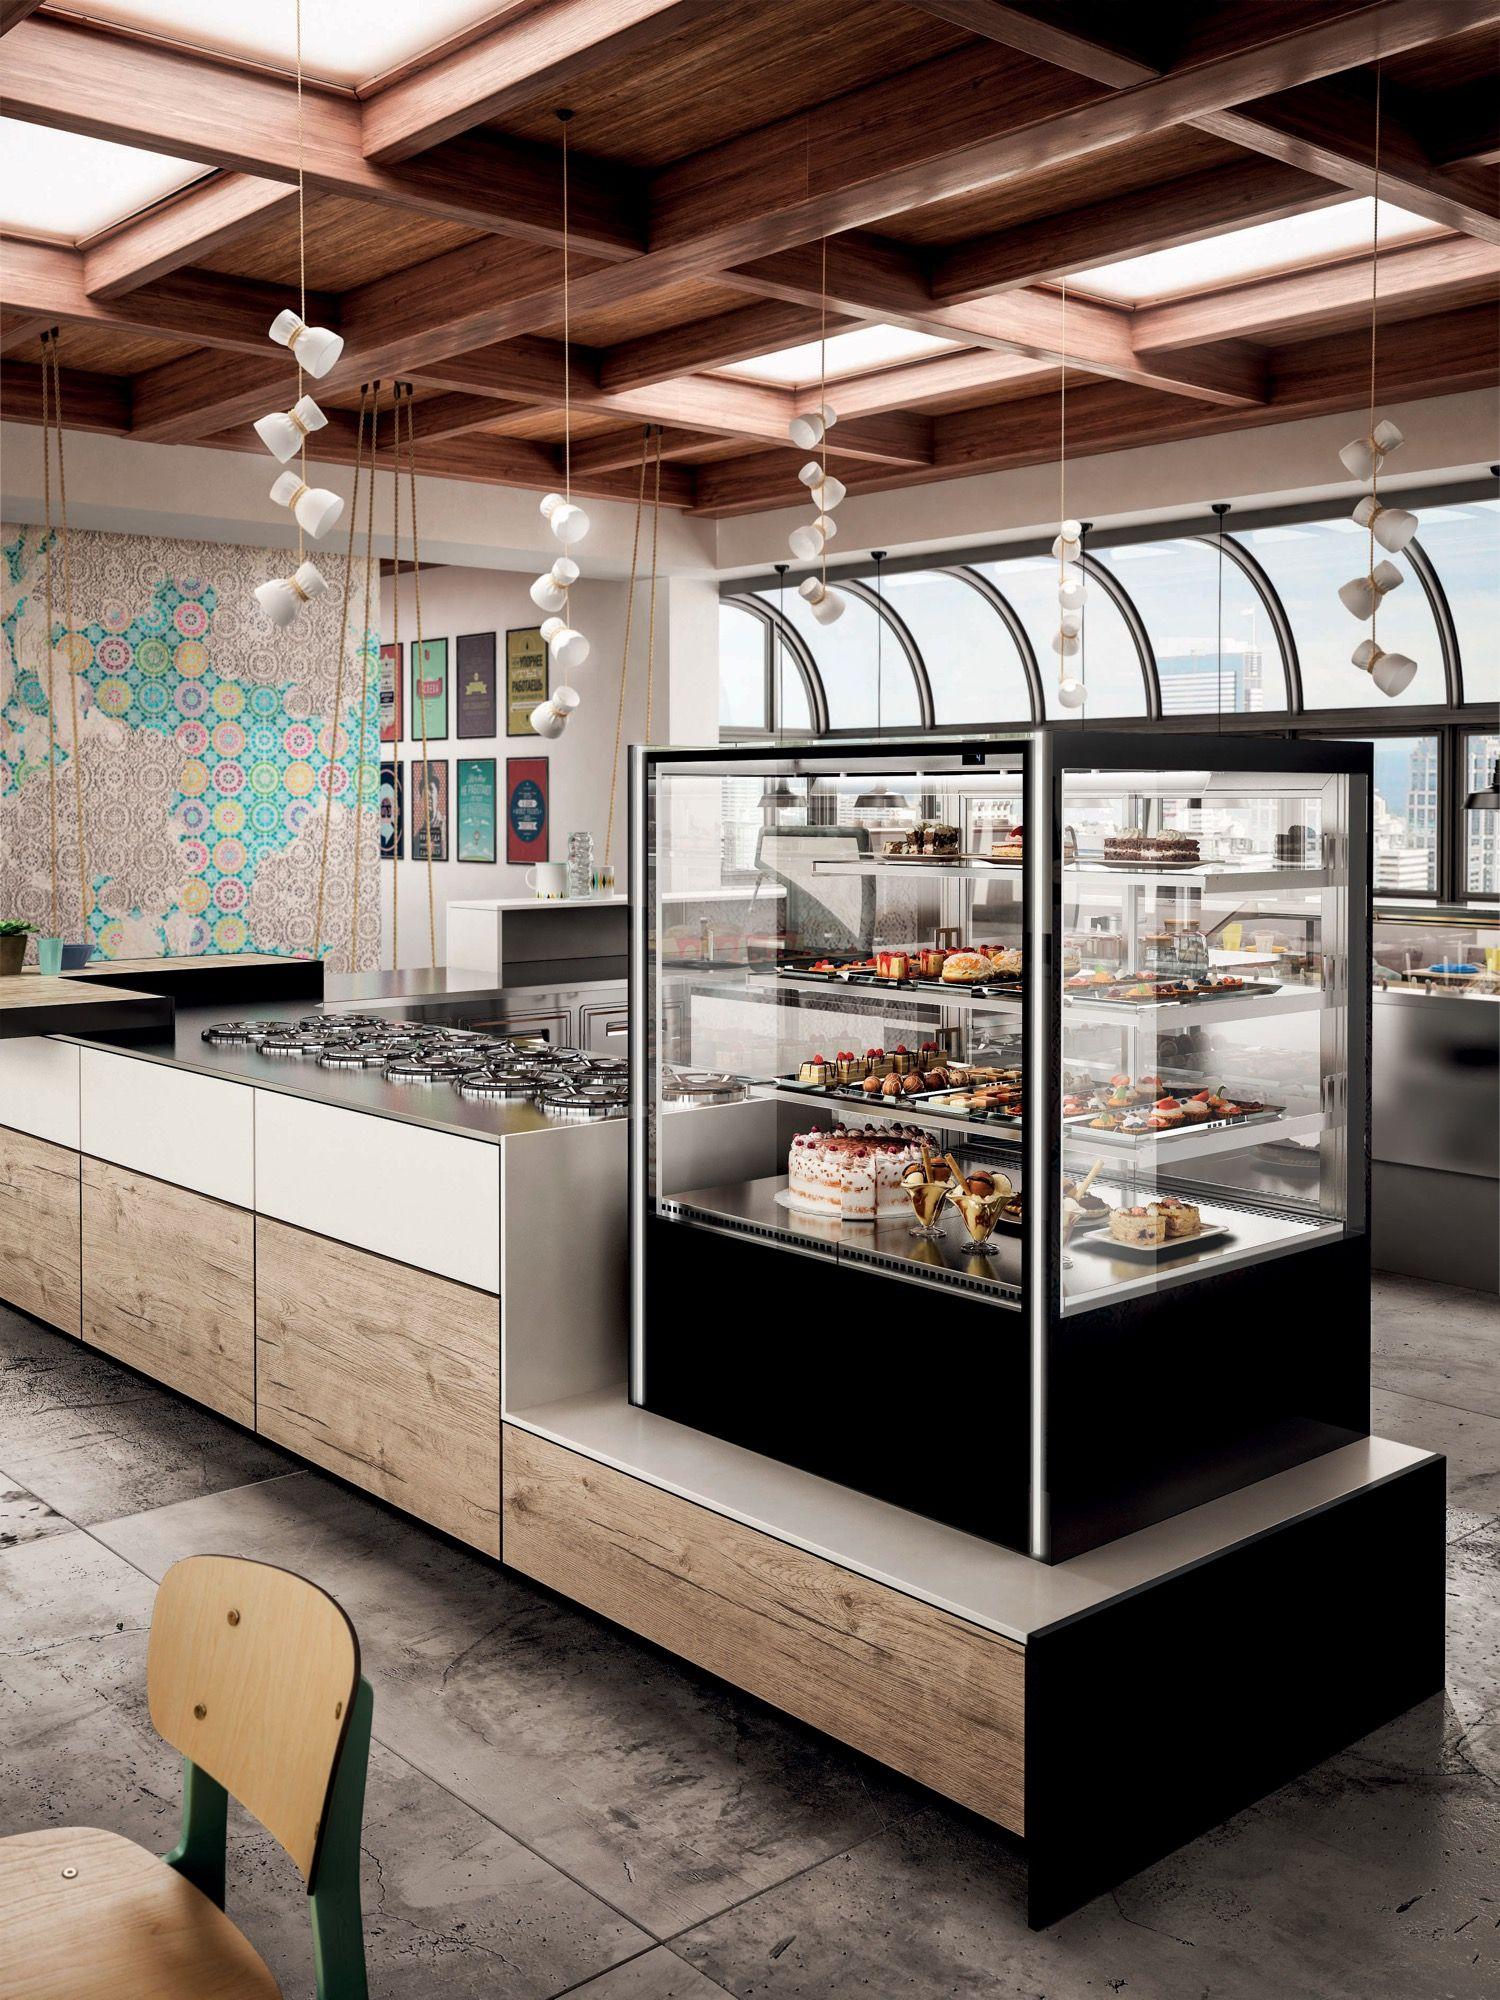 Arredo bar modello be like grab and go en 2019 for Idee arredamento bar